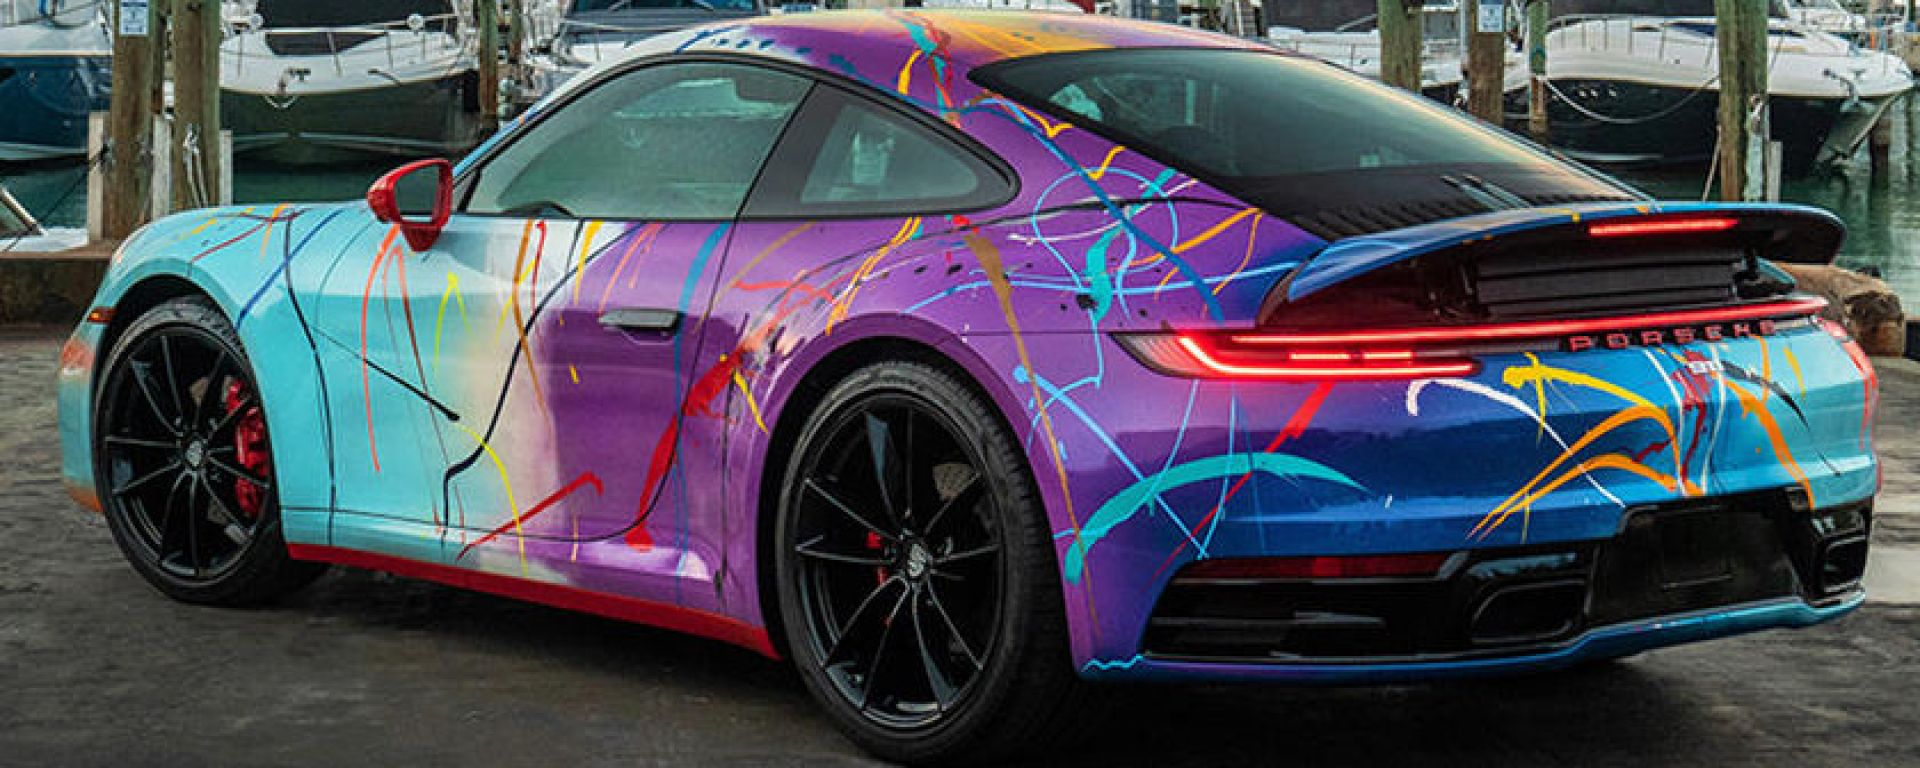 Porsche 911 by Rich B. Caliente: la coupé tedesca multicolor all'asta